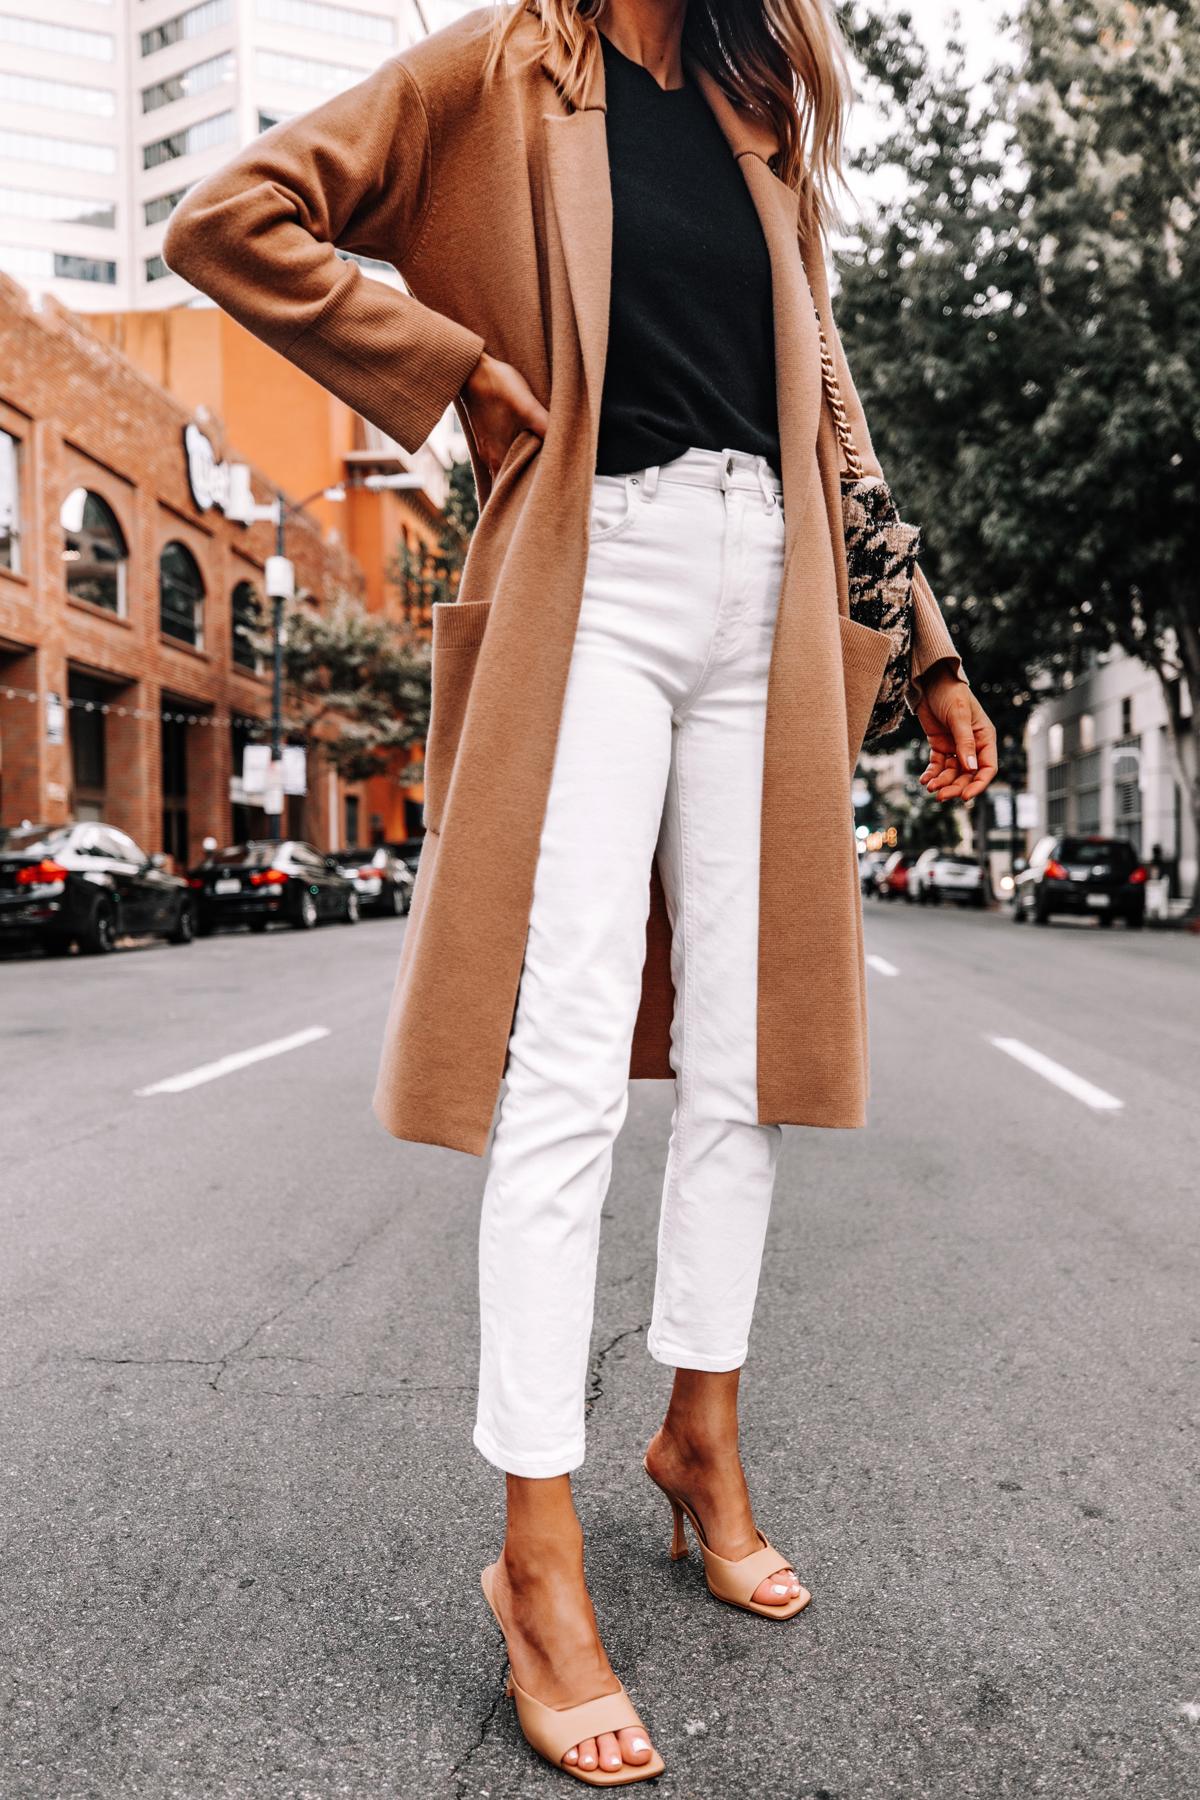 Fashion Jackson Wearing Jcrew Camel Coatigan Black Sweater Everlane White Jeans Tan Heeled Sandals 1